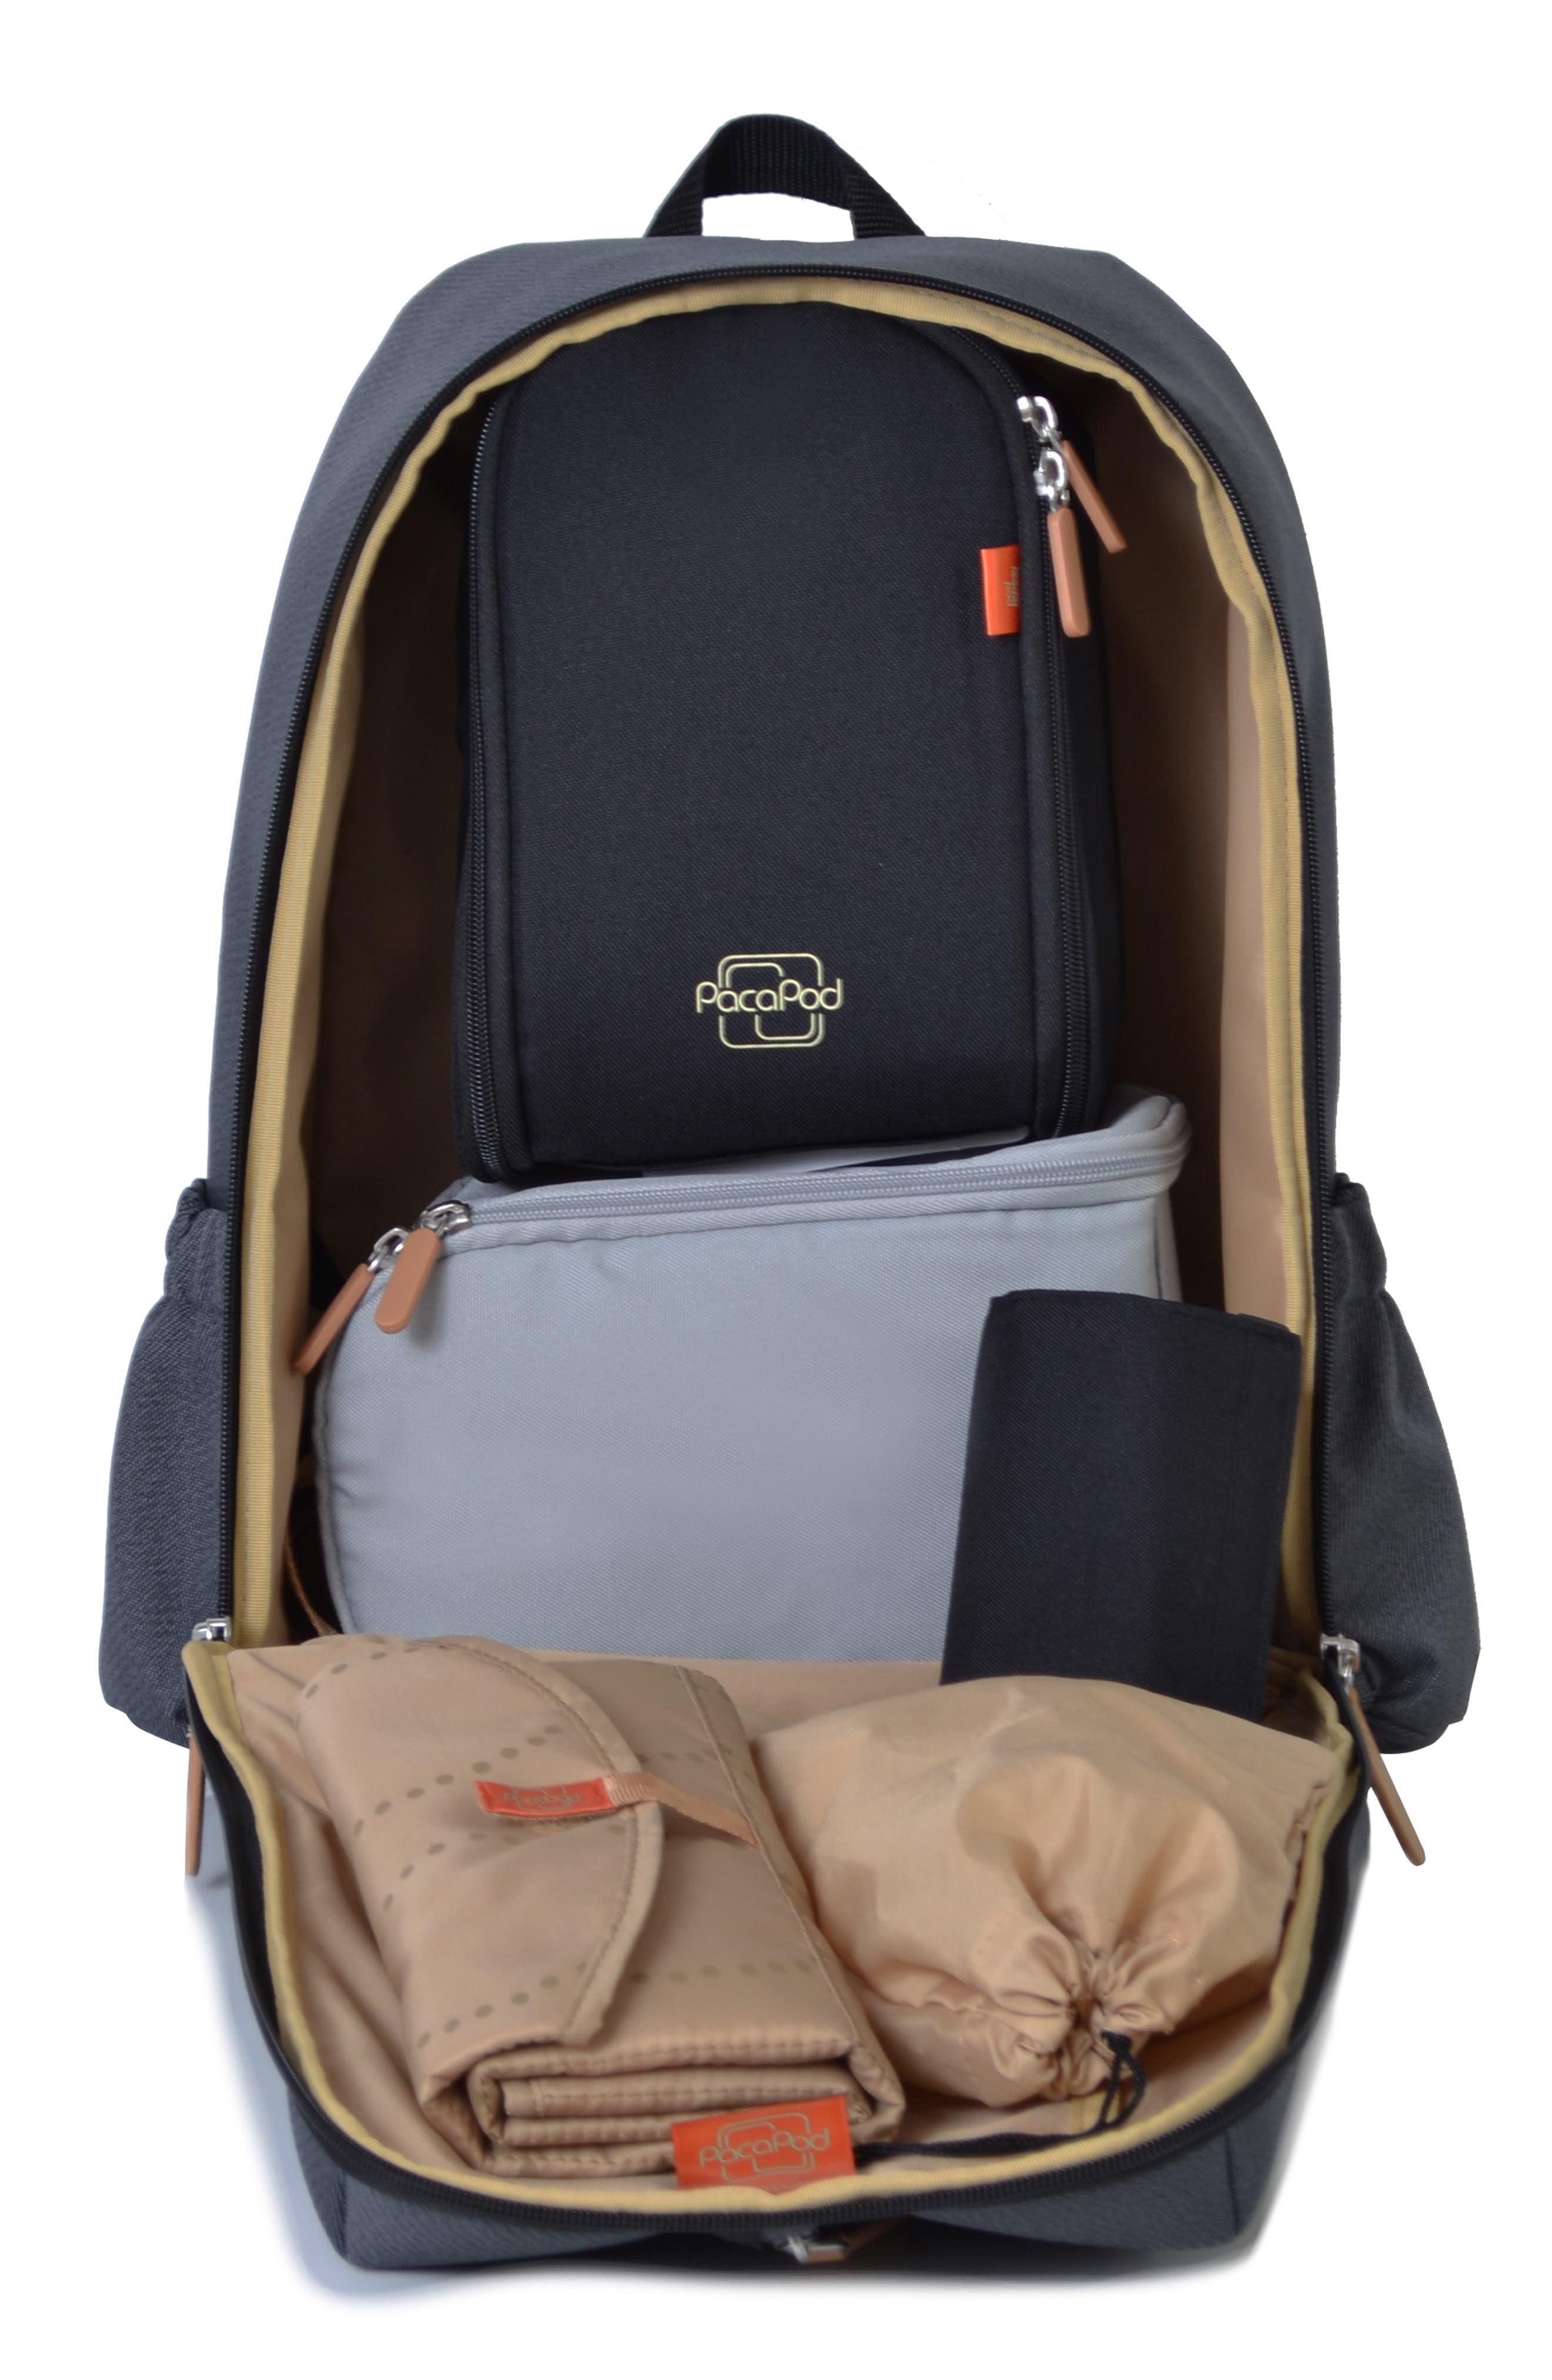 Picos Pack Diaper Backpack,                             Alternate thumbnail 2, color,                             BLACK CHARCOAL